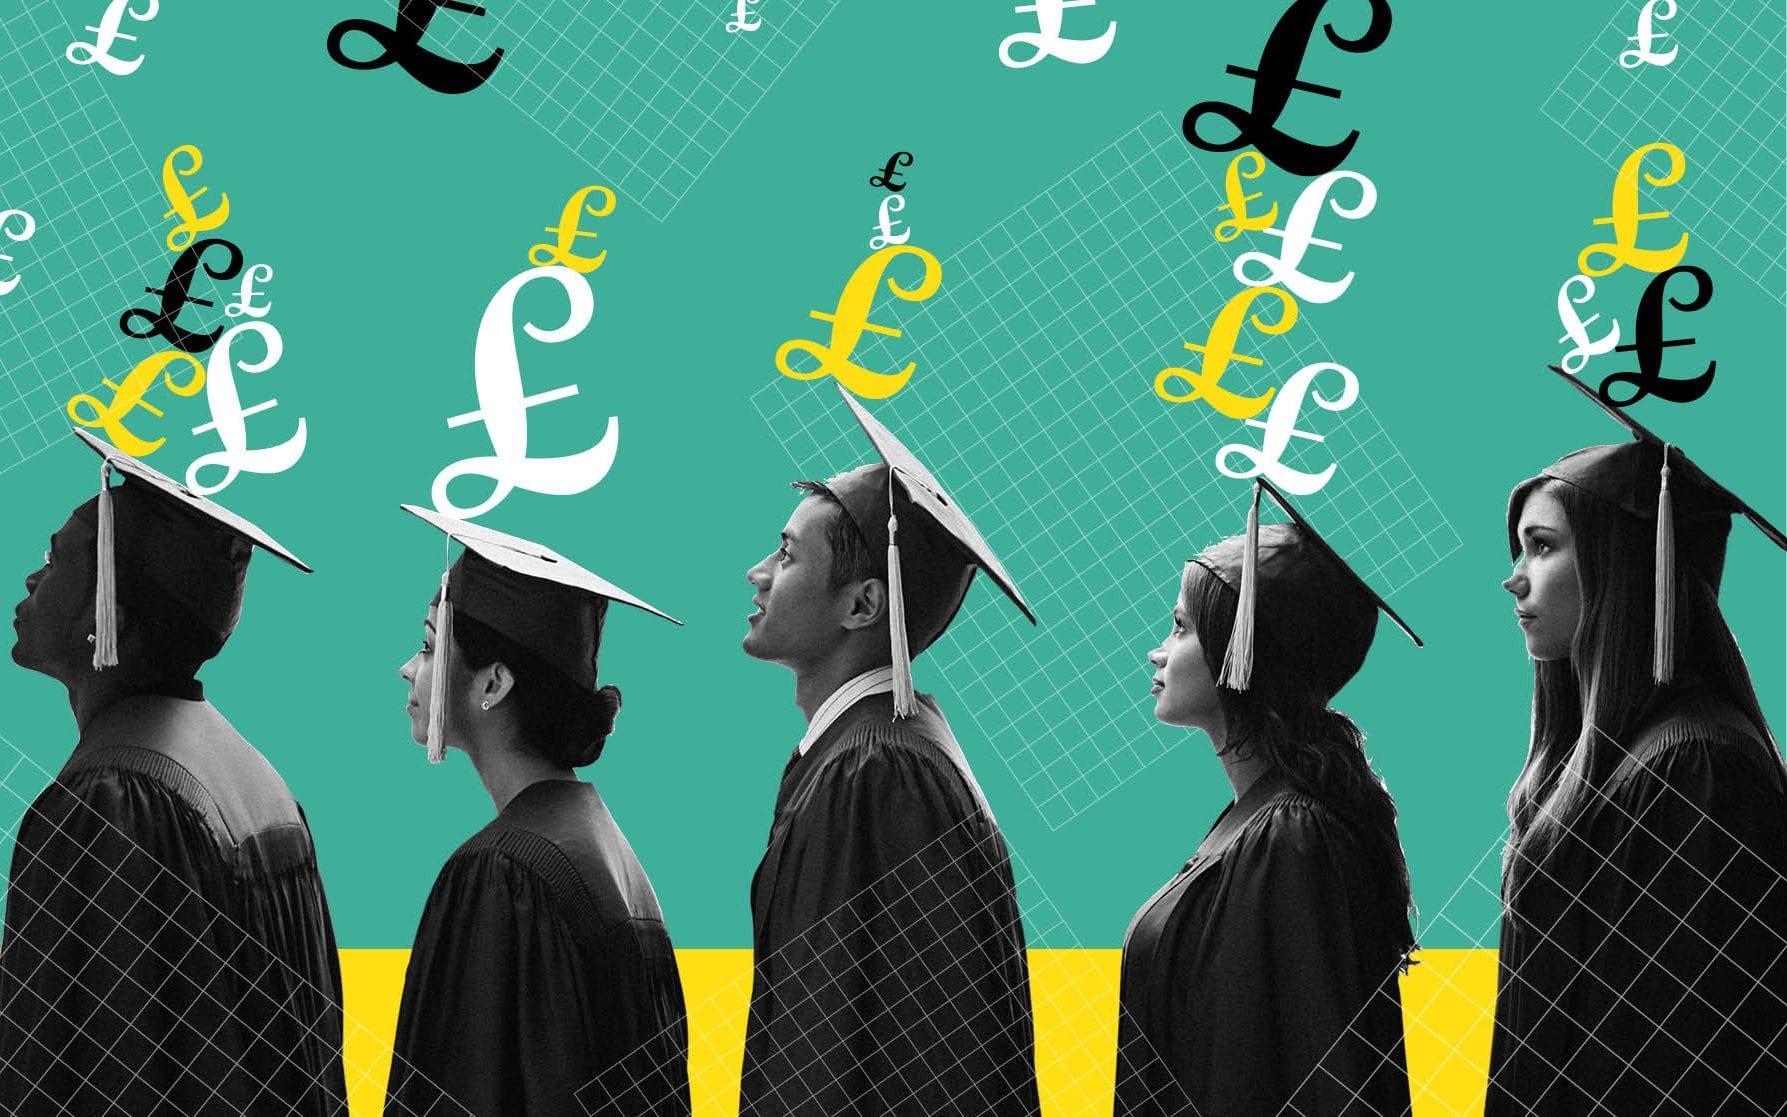 graduate-earnings_trans_NvBQzQNjv4BqxnlSljj15z1o8iKqMGA7tyH0-jRUT4rHK8EgtaGoQwQ.jpg